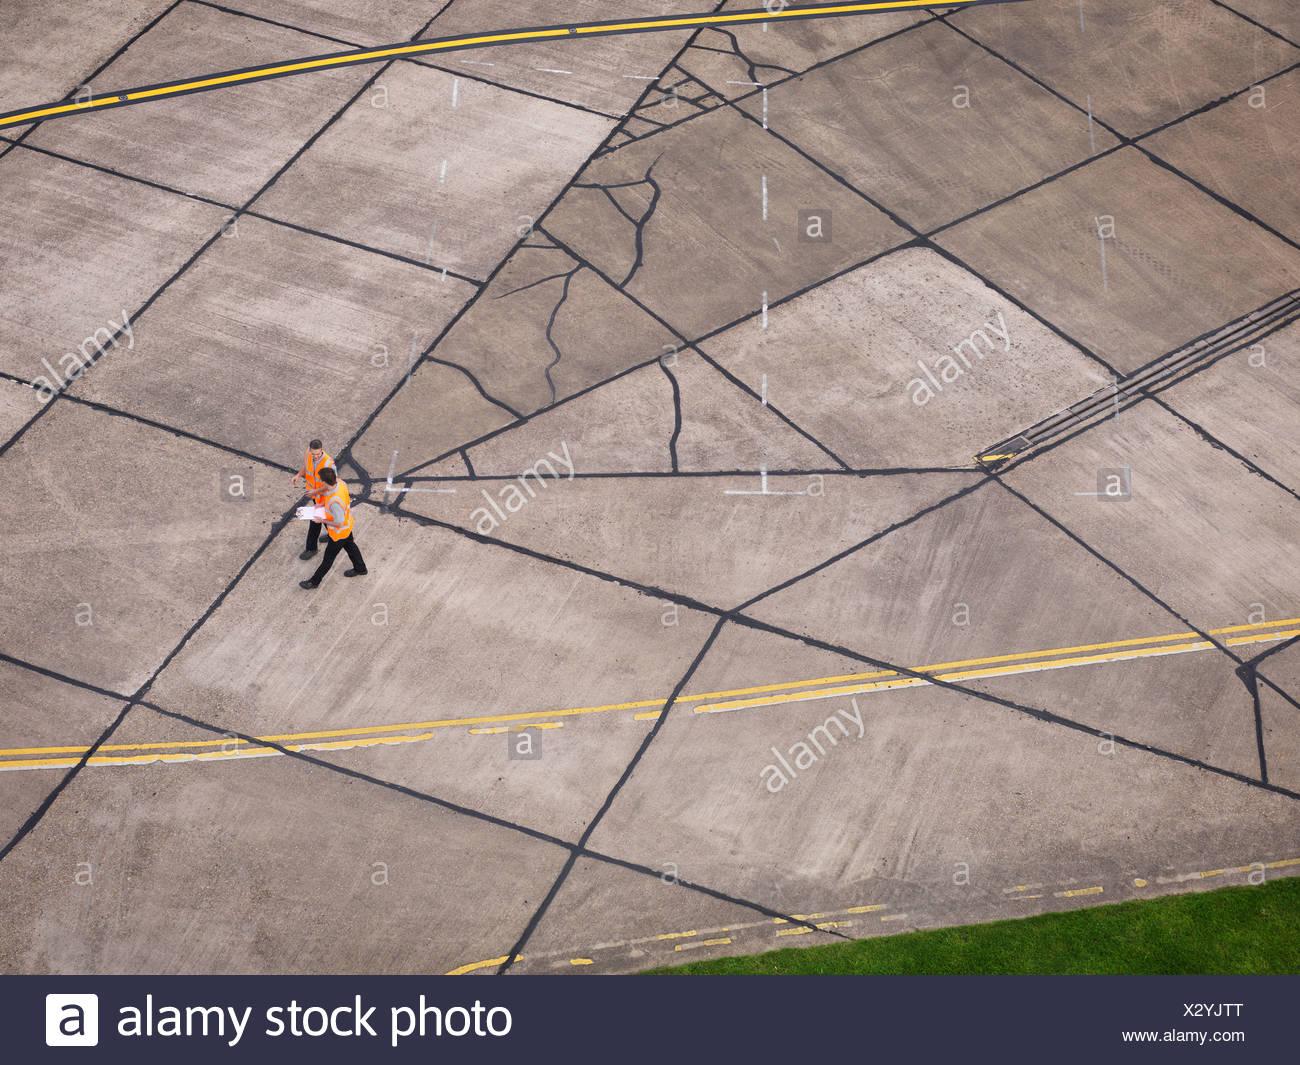 Engineers on aircraft runway - Stock Image